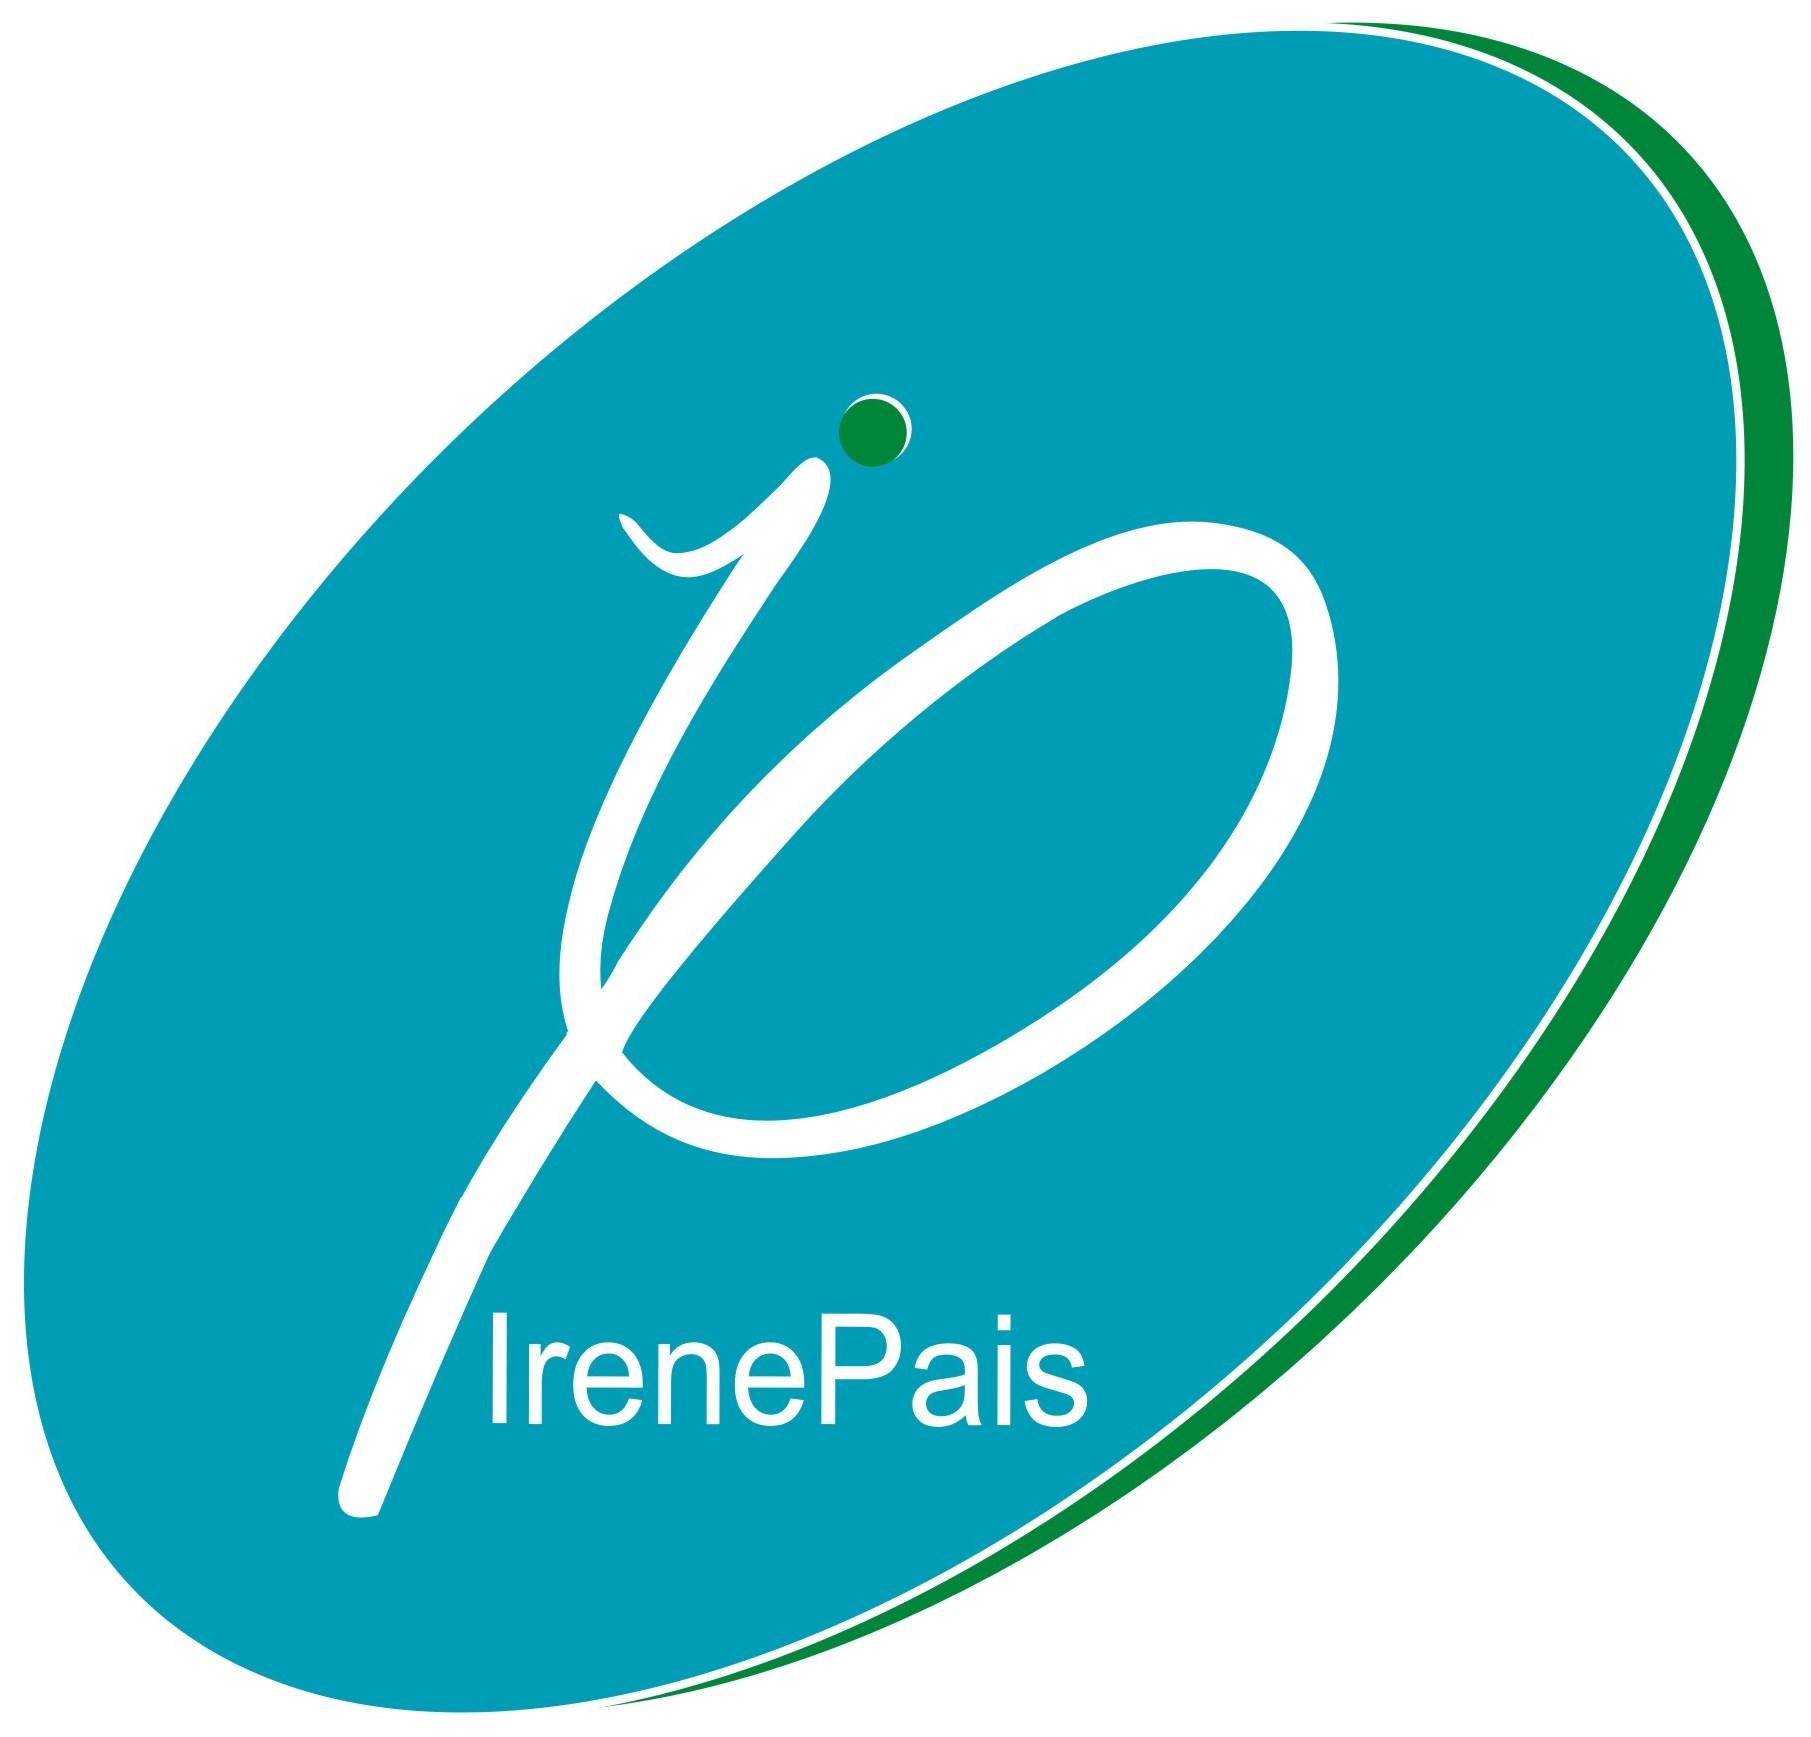 IRENE PAIS